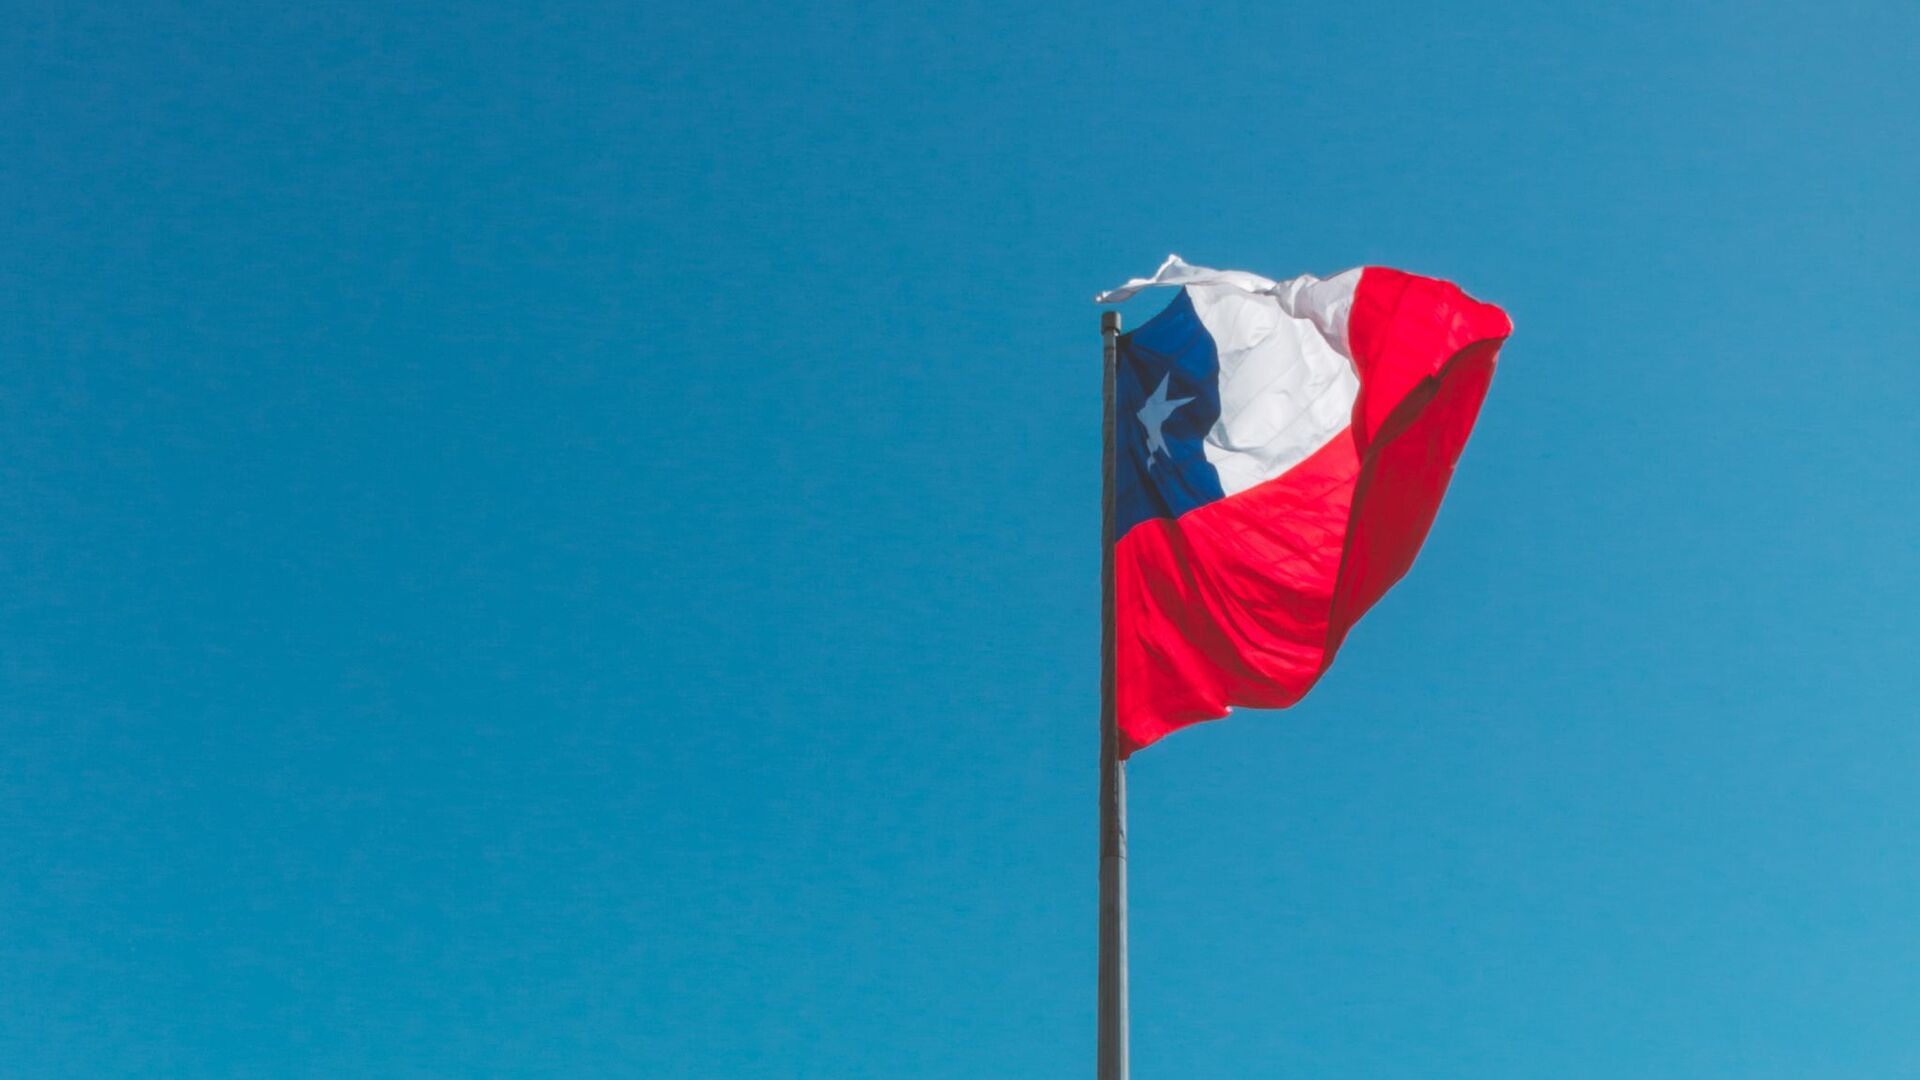 La bandera de Chile - Sputnik Mundo, 1920, 27.04.2021